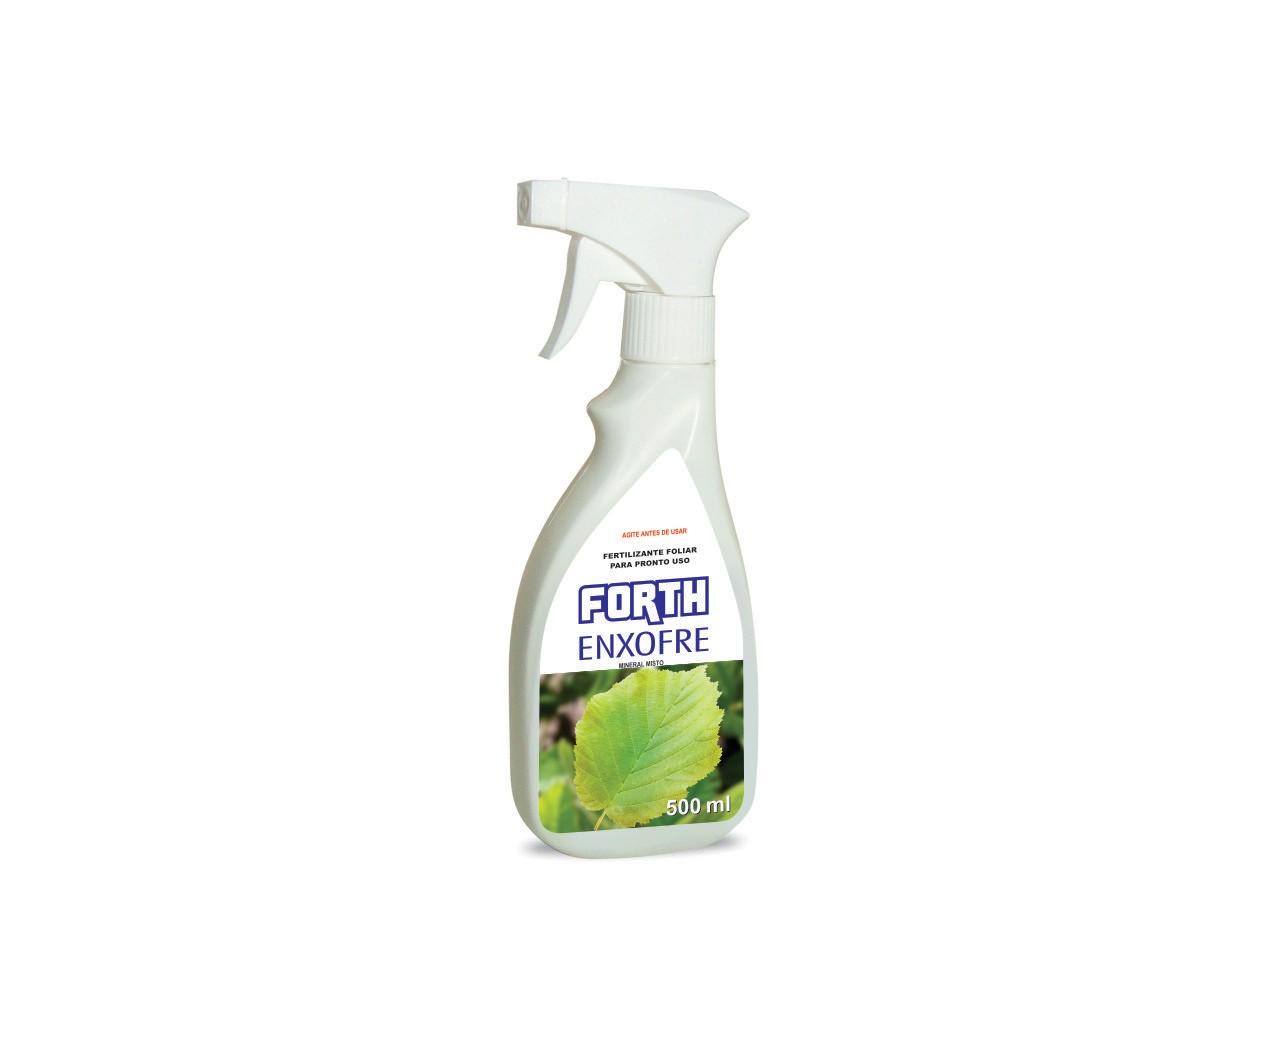 Fertilizante Forth Enxofre pronto para uso 500ml  - Vasos Raiz Loja Oficial